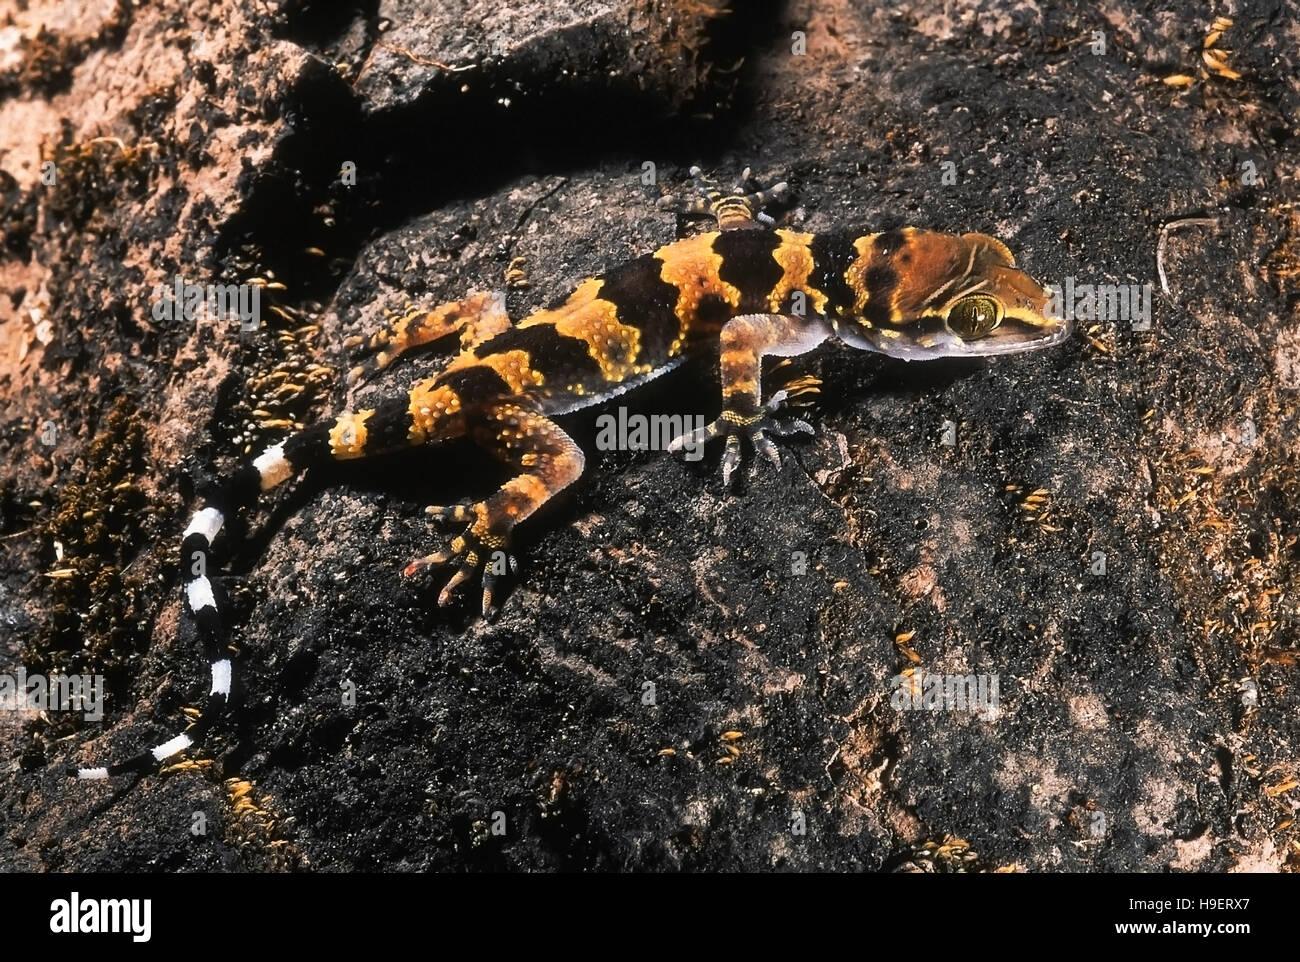 Bandas de Rock lagartija Hemidactylus maculatus. Los menores. Fotografiado en Sinhagad Fort, cerca de Pune, Maharashtra, Imagen De Stock